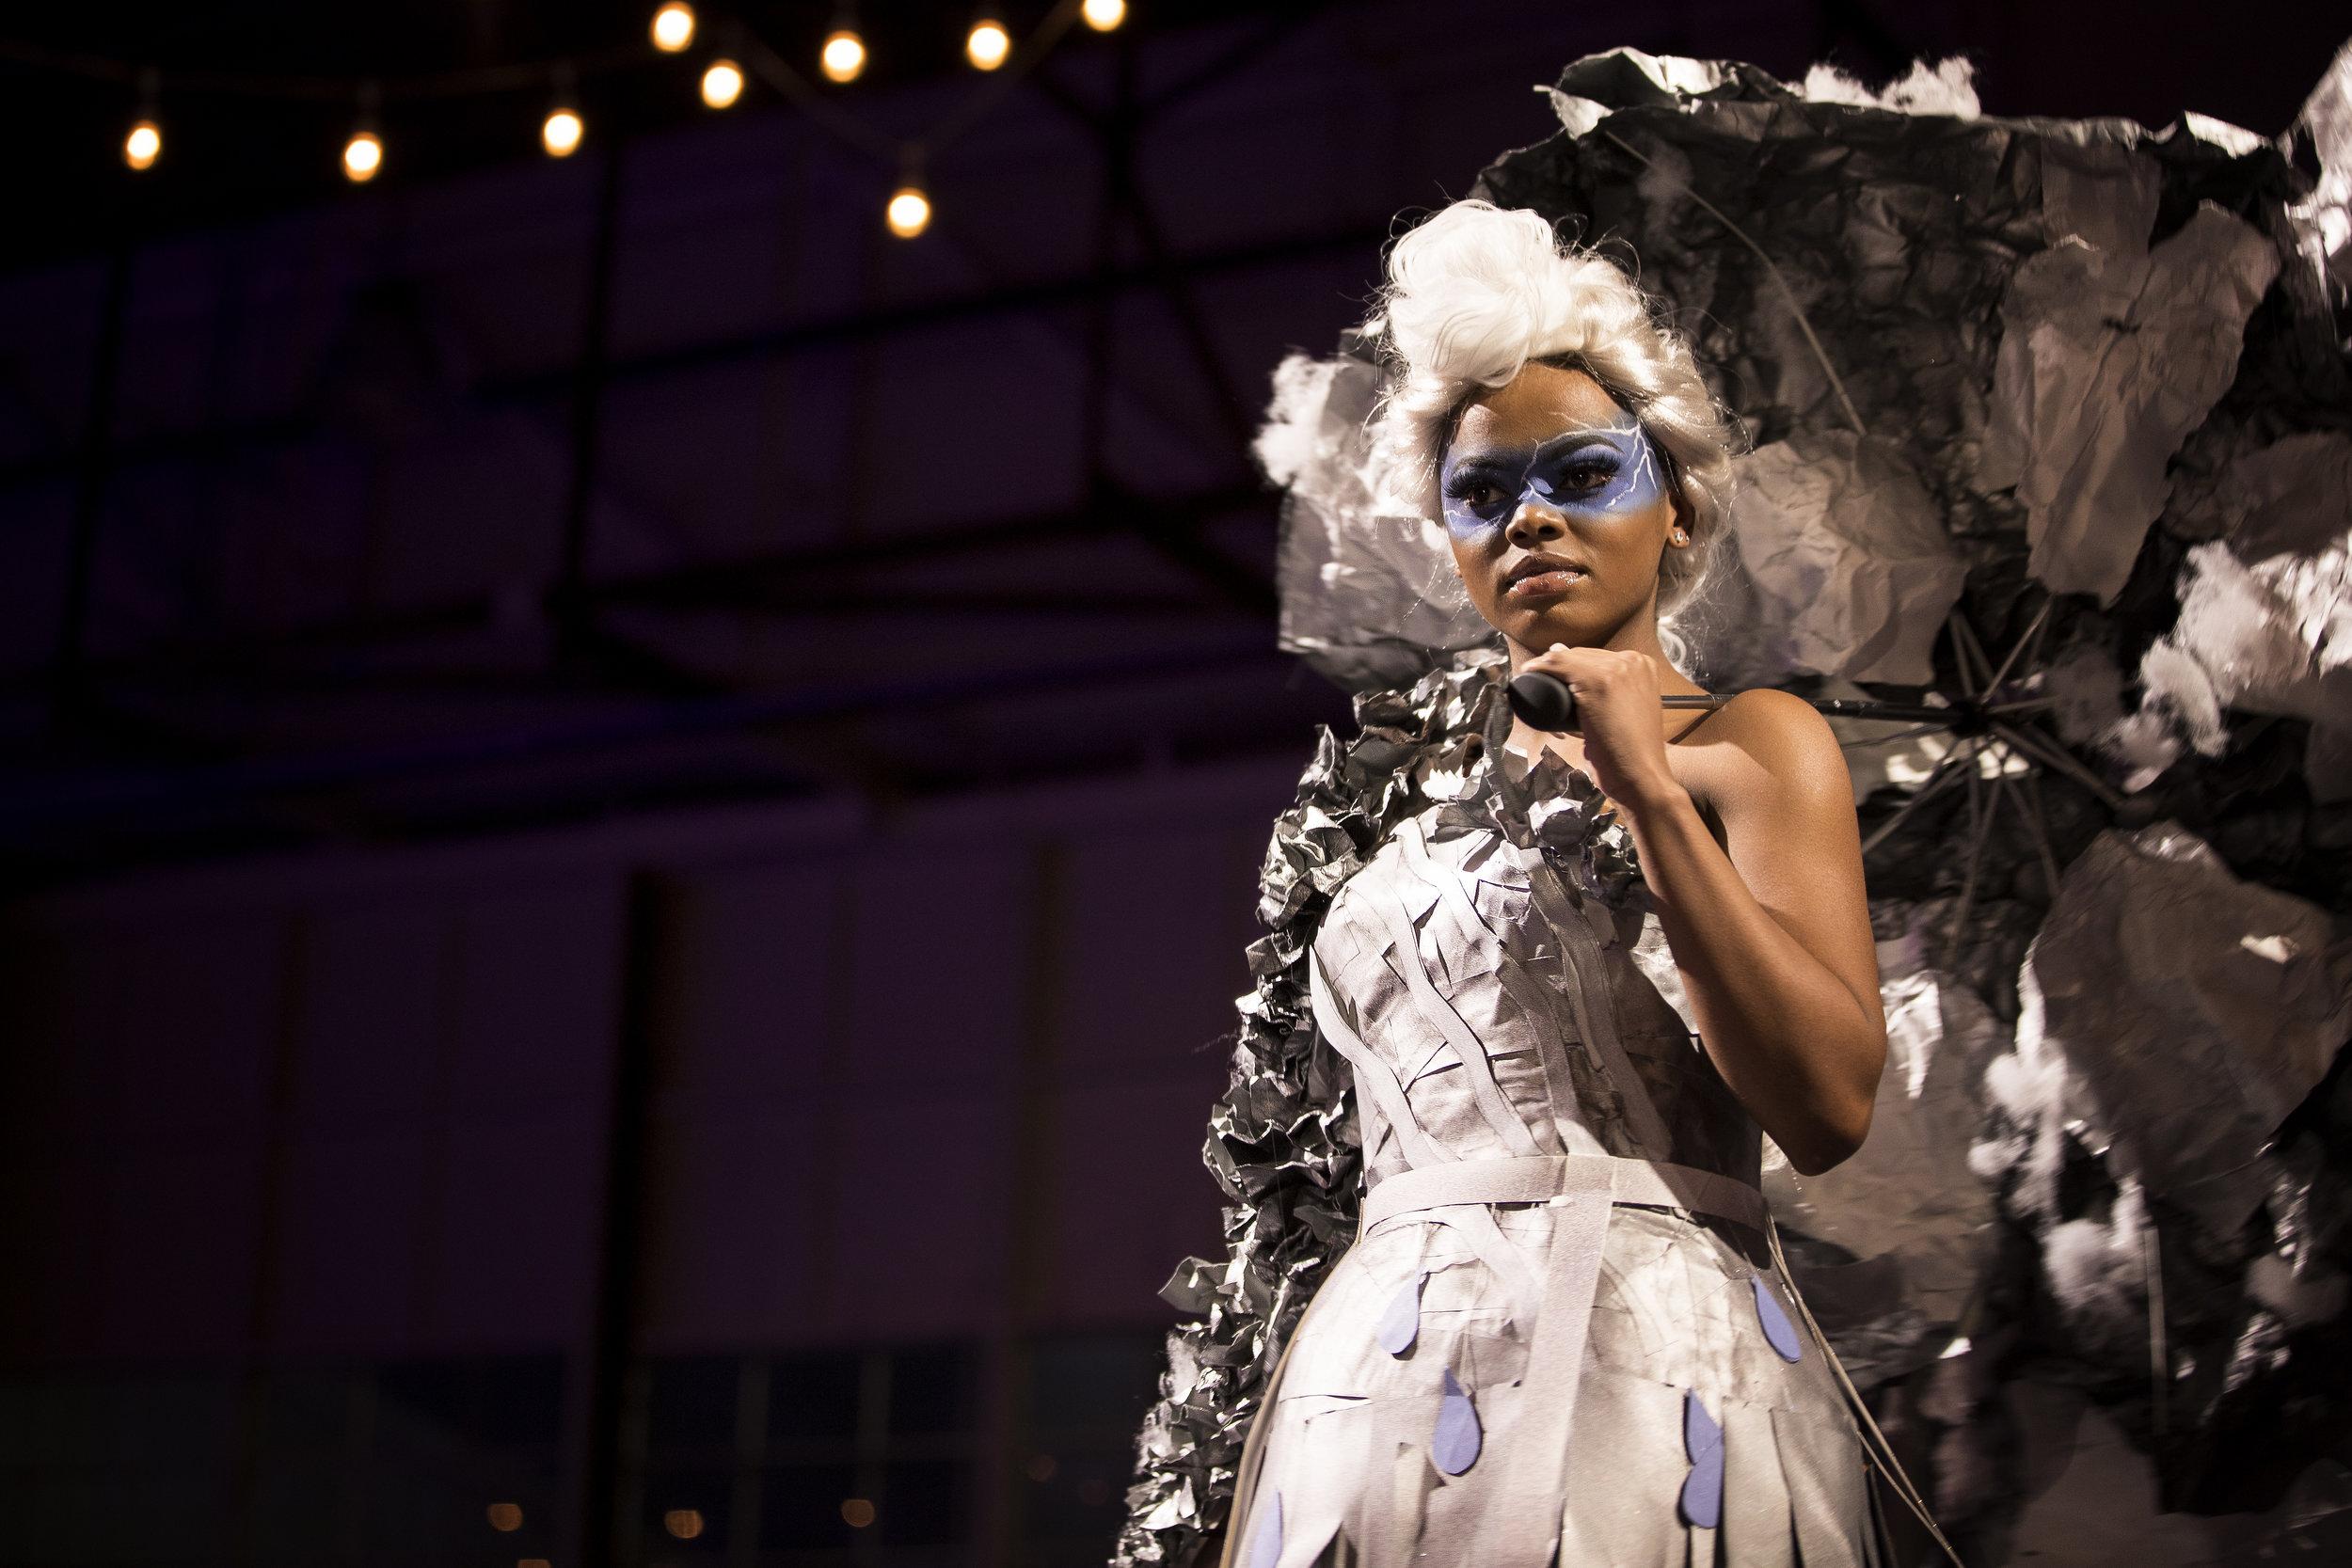 Paper Fashion Show 2019 - 003.jpg